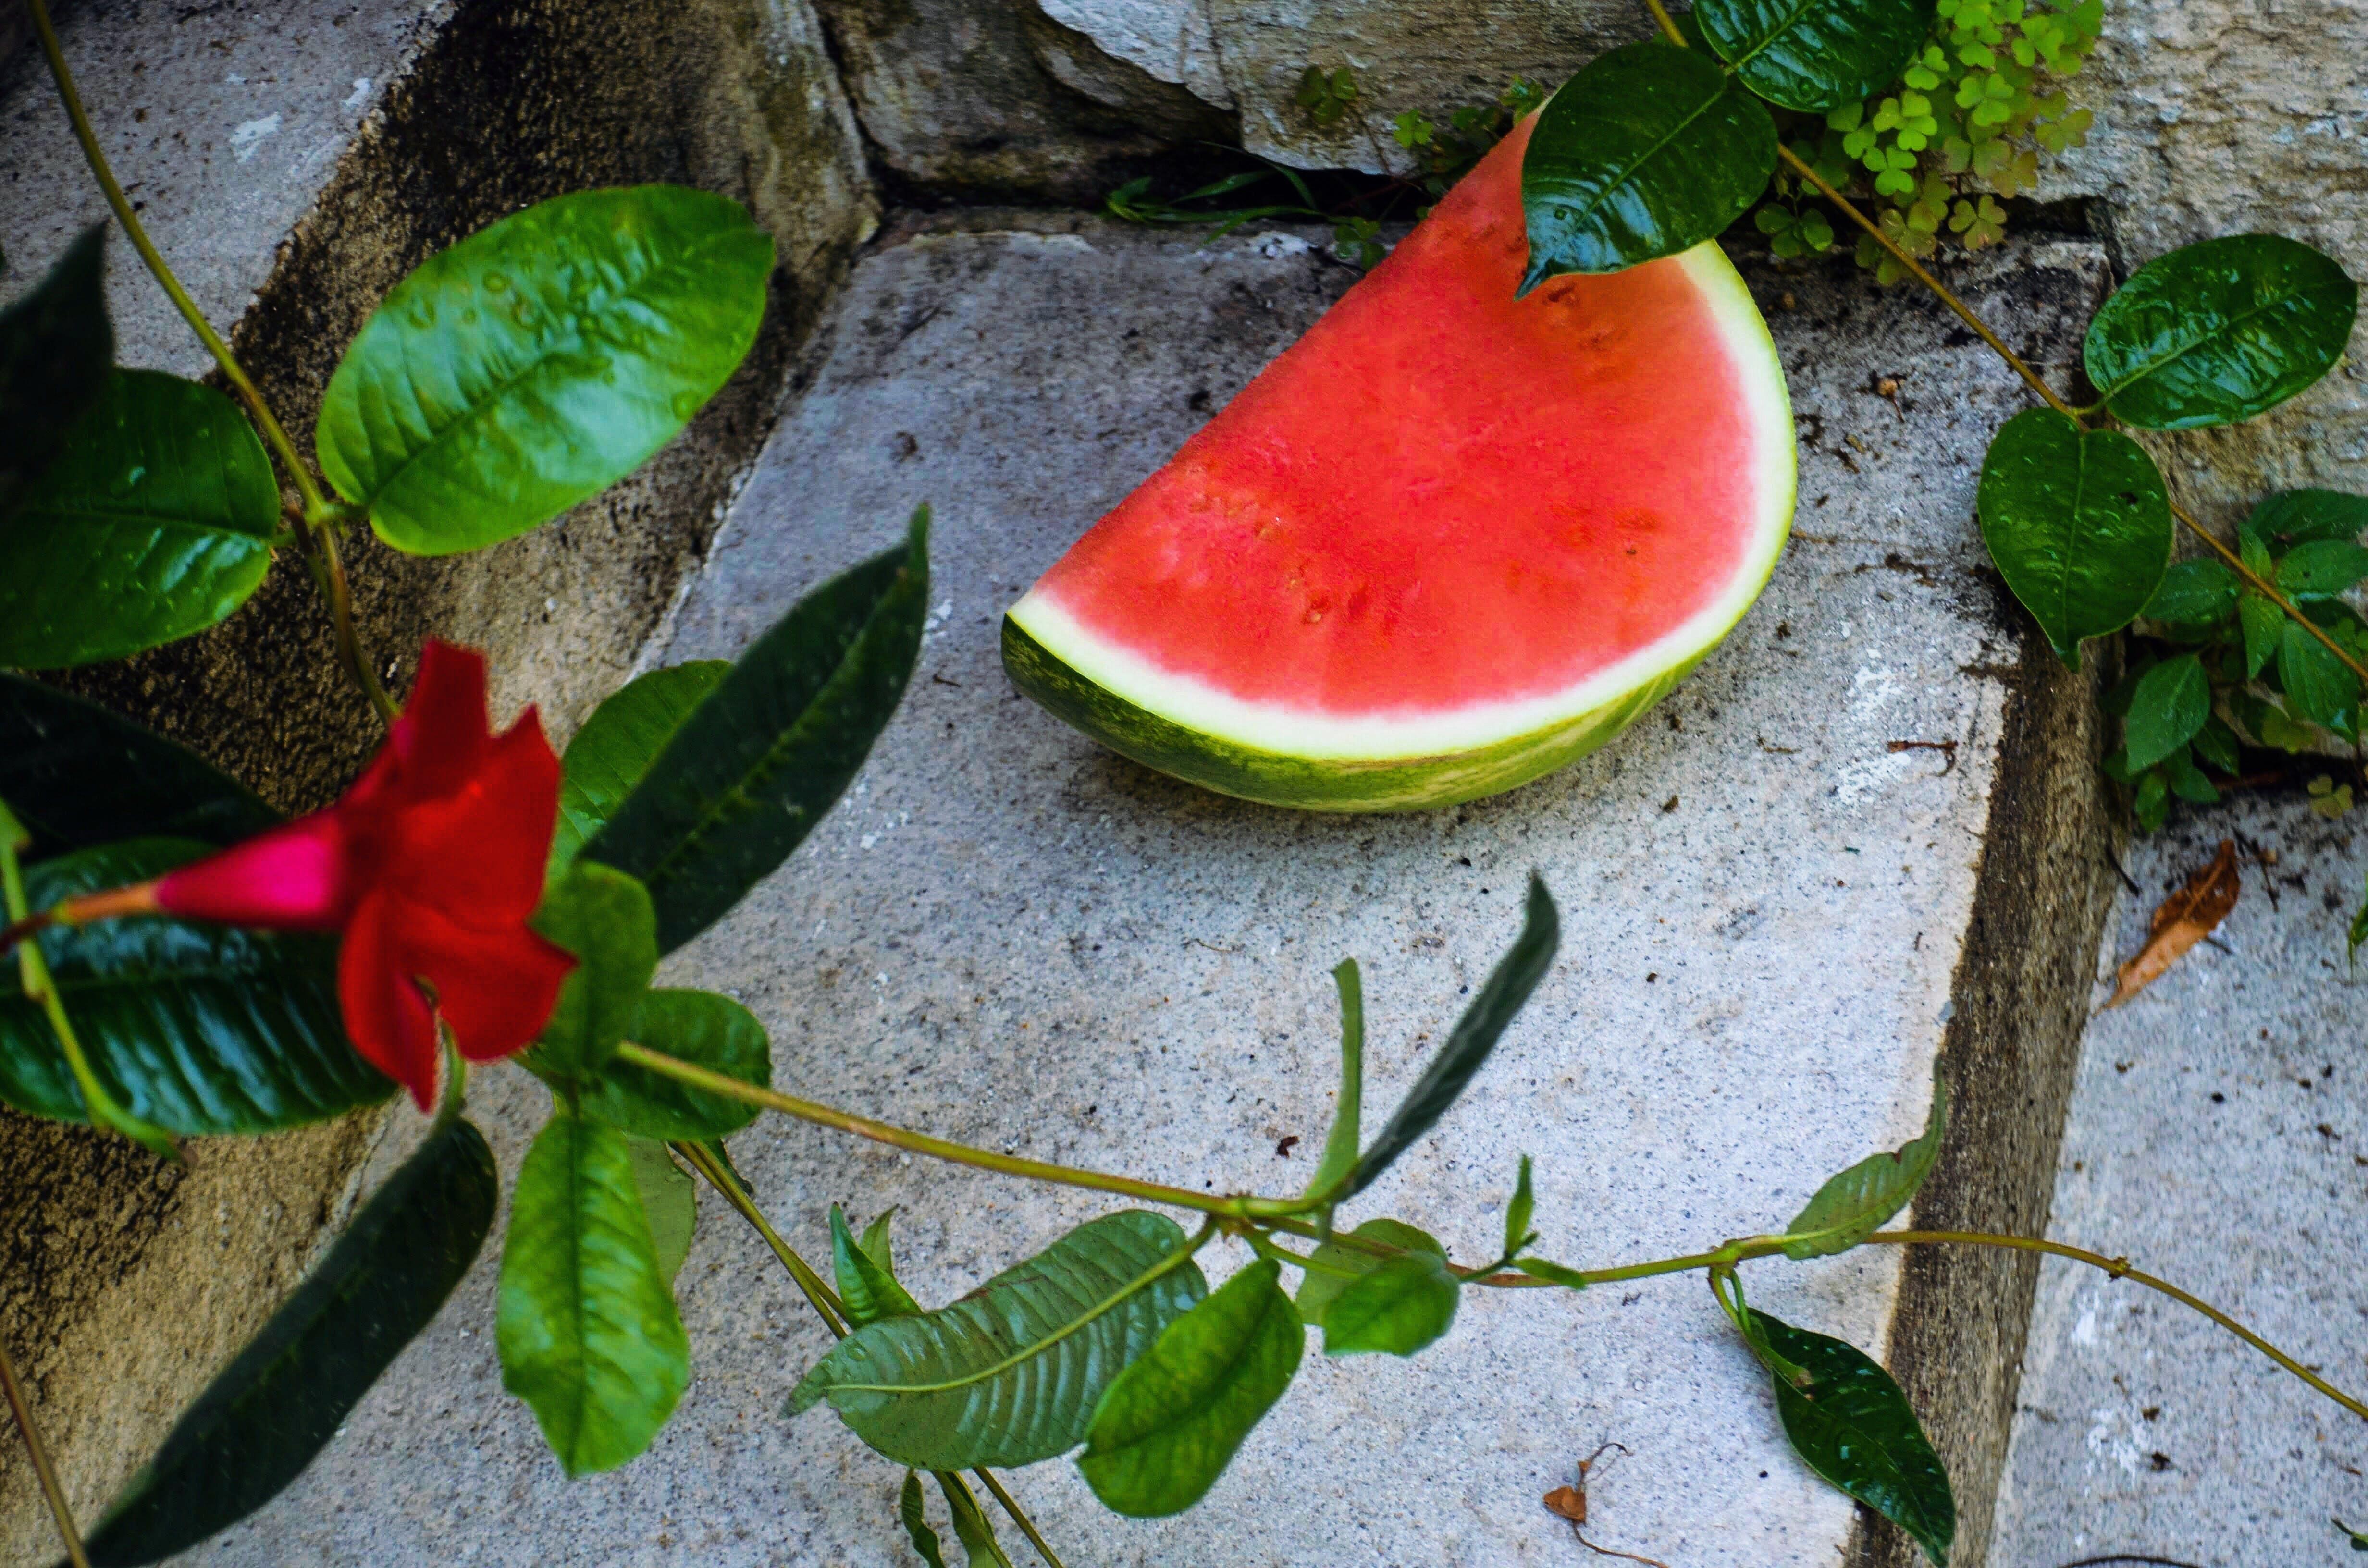 Slice Of Watermelon Beside Green Leafed Plants